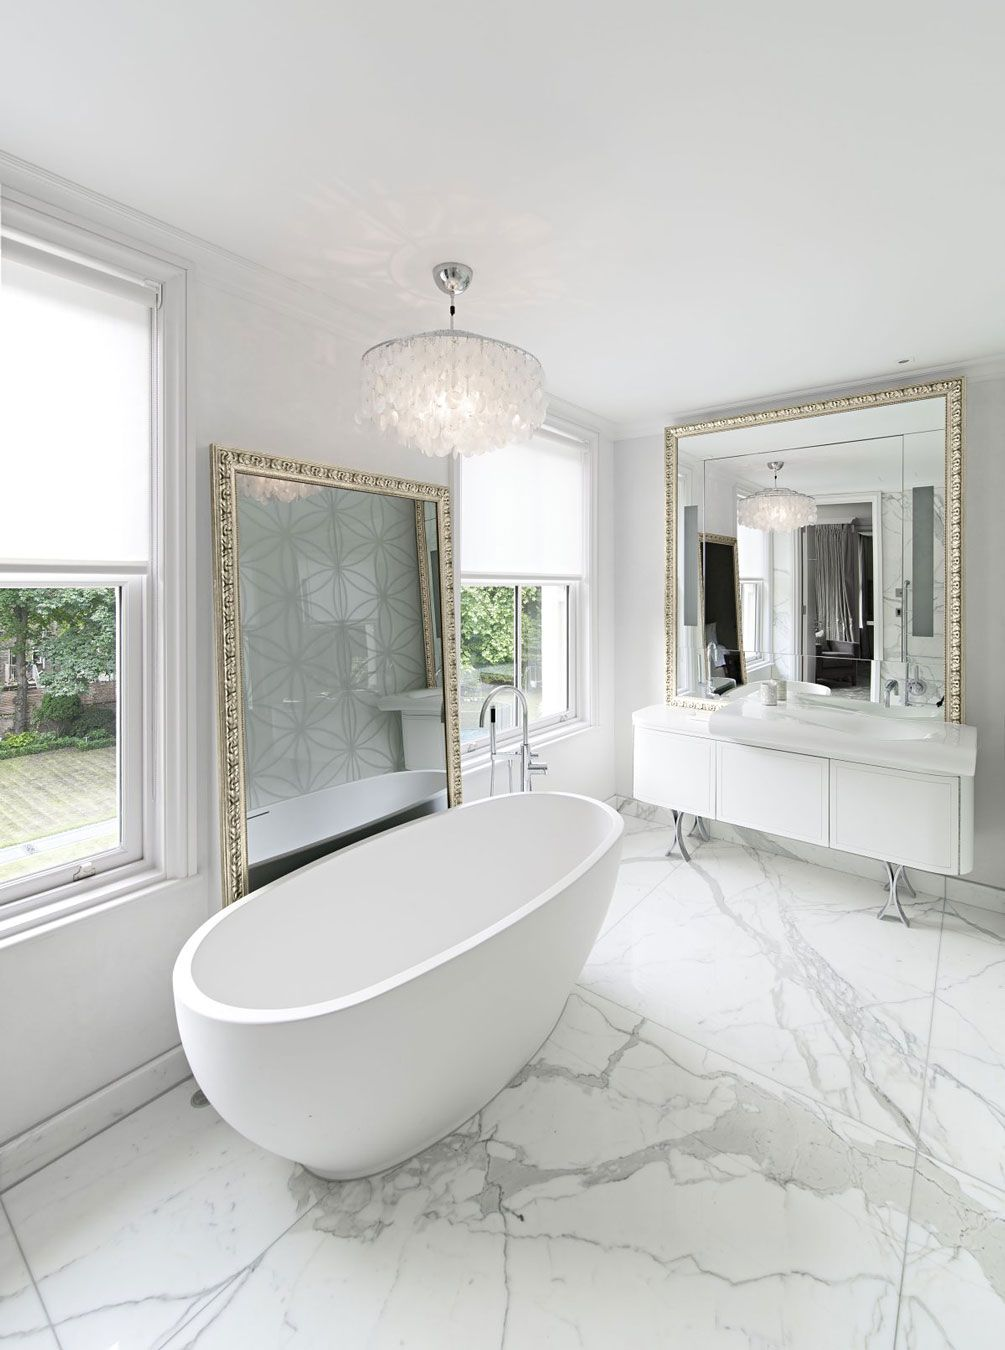 Marble Bathroom With Awesome Design Ideas | Bathroom designs ...